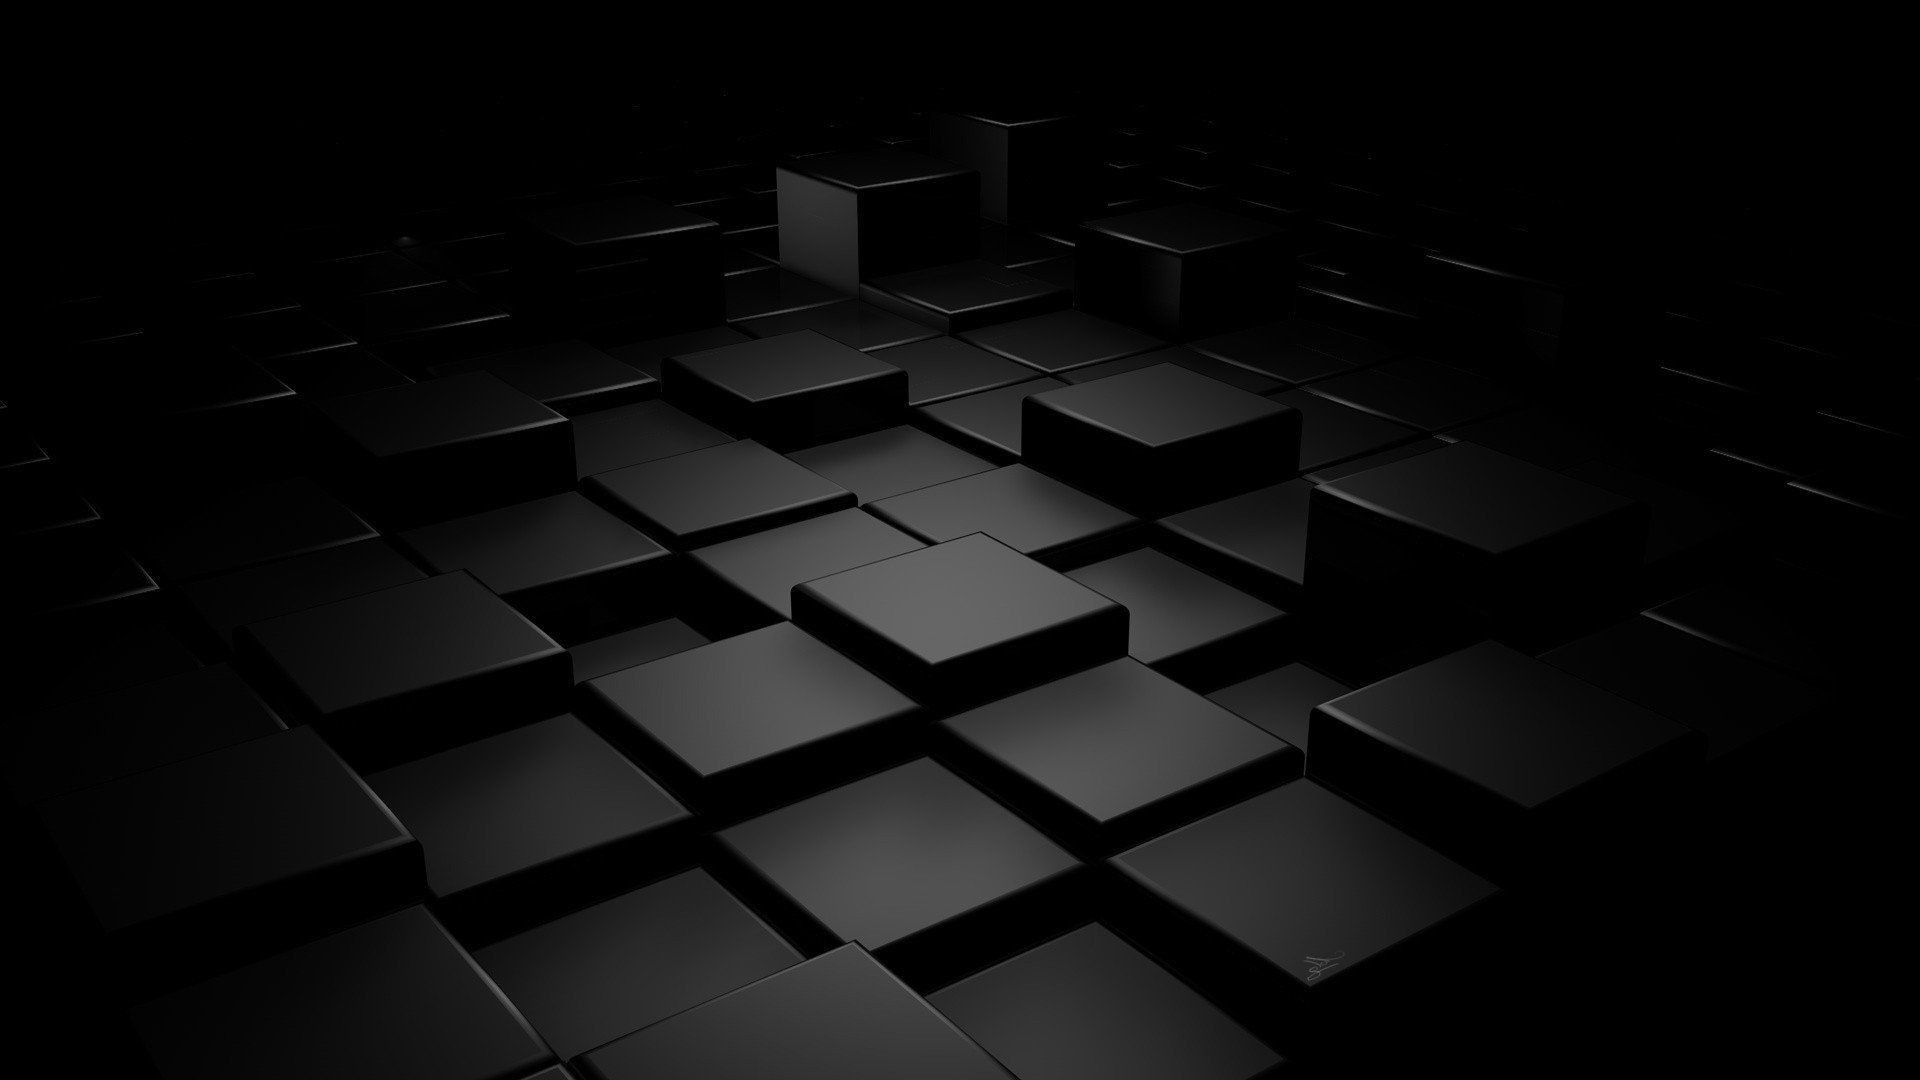 Res: 1920x1080, http://cdn.wonderfulengineering.com/wp-content/uploads/2016/01/black- wallpaper-7.jpg